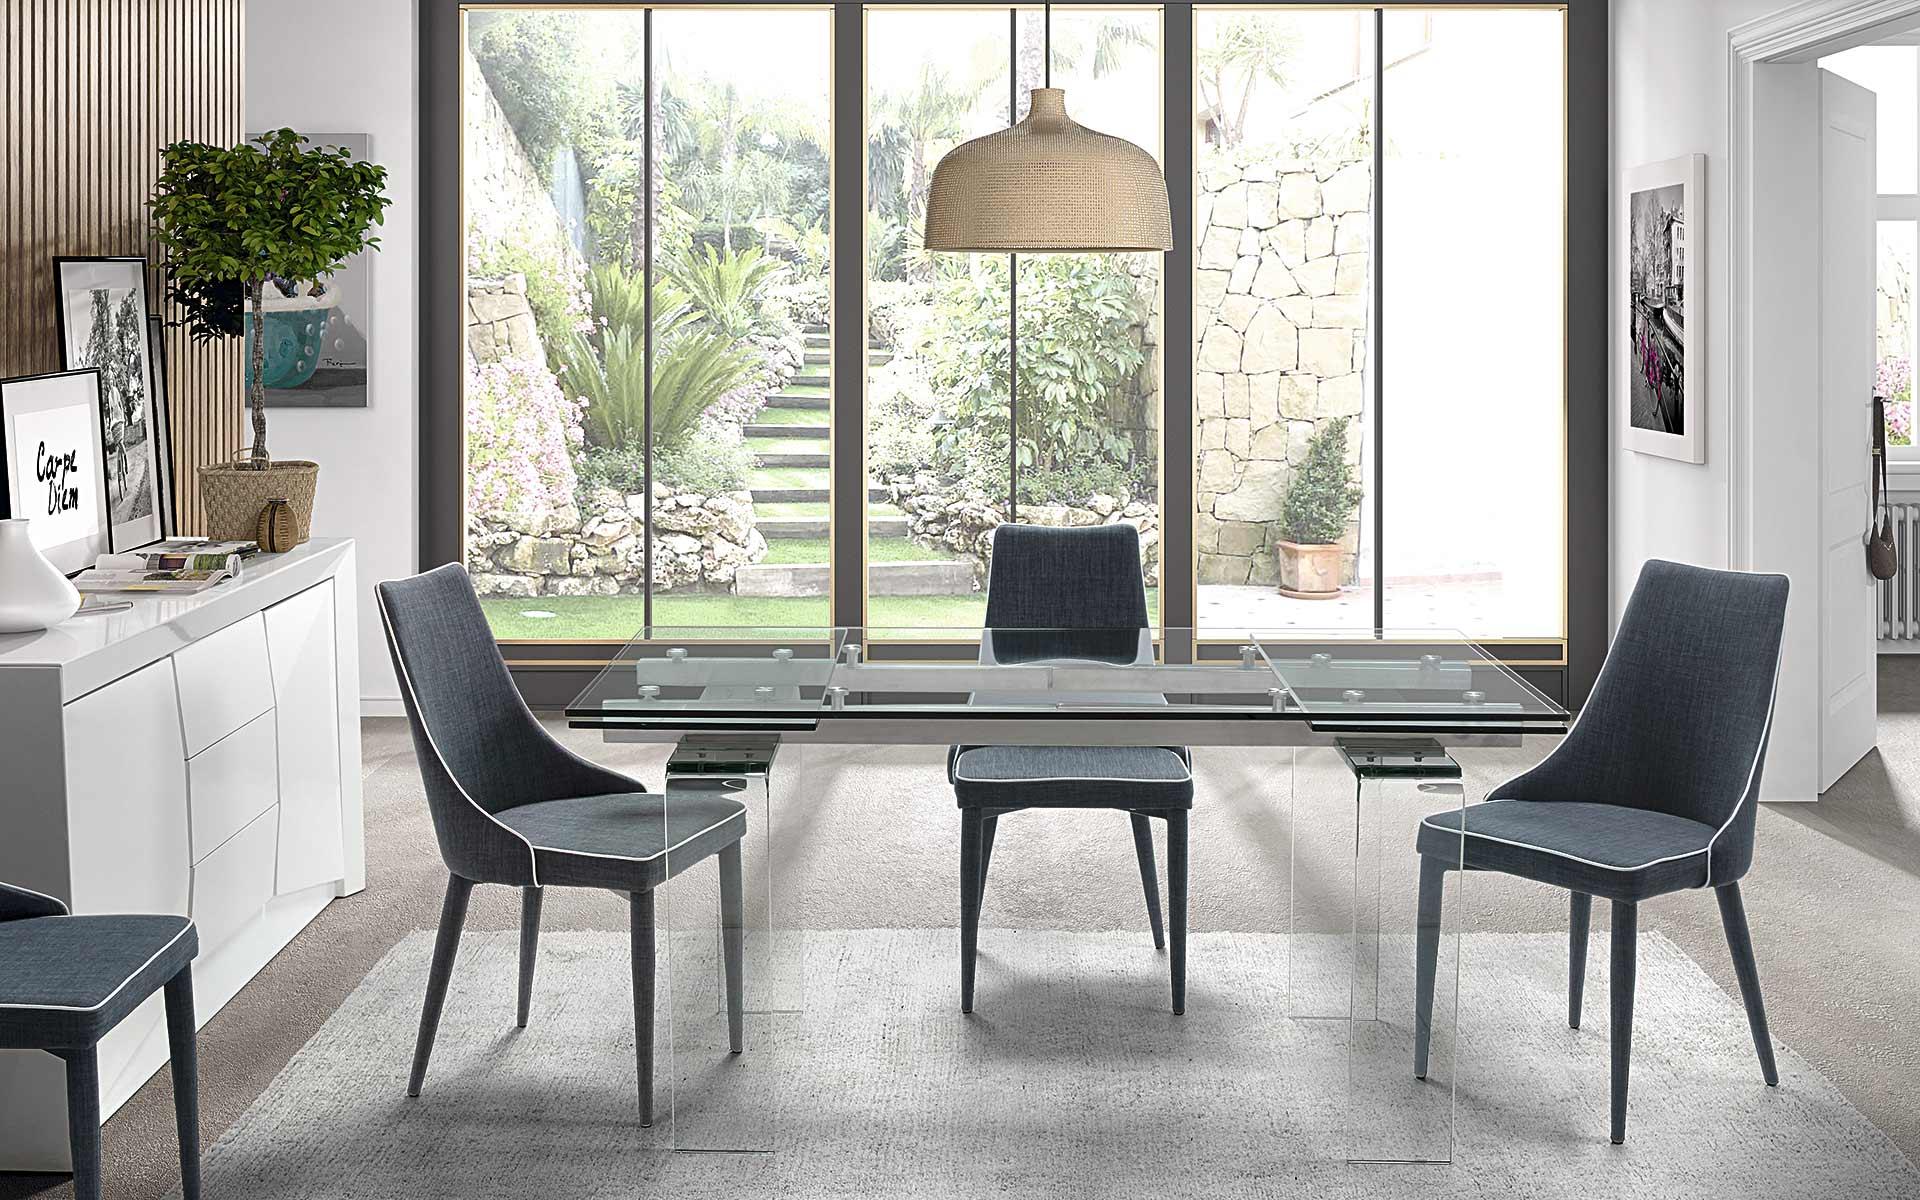 Muebles el gitano obtenga ideas dise o de muebles para for Muebles gitanos